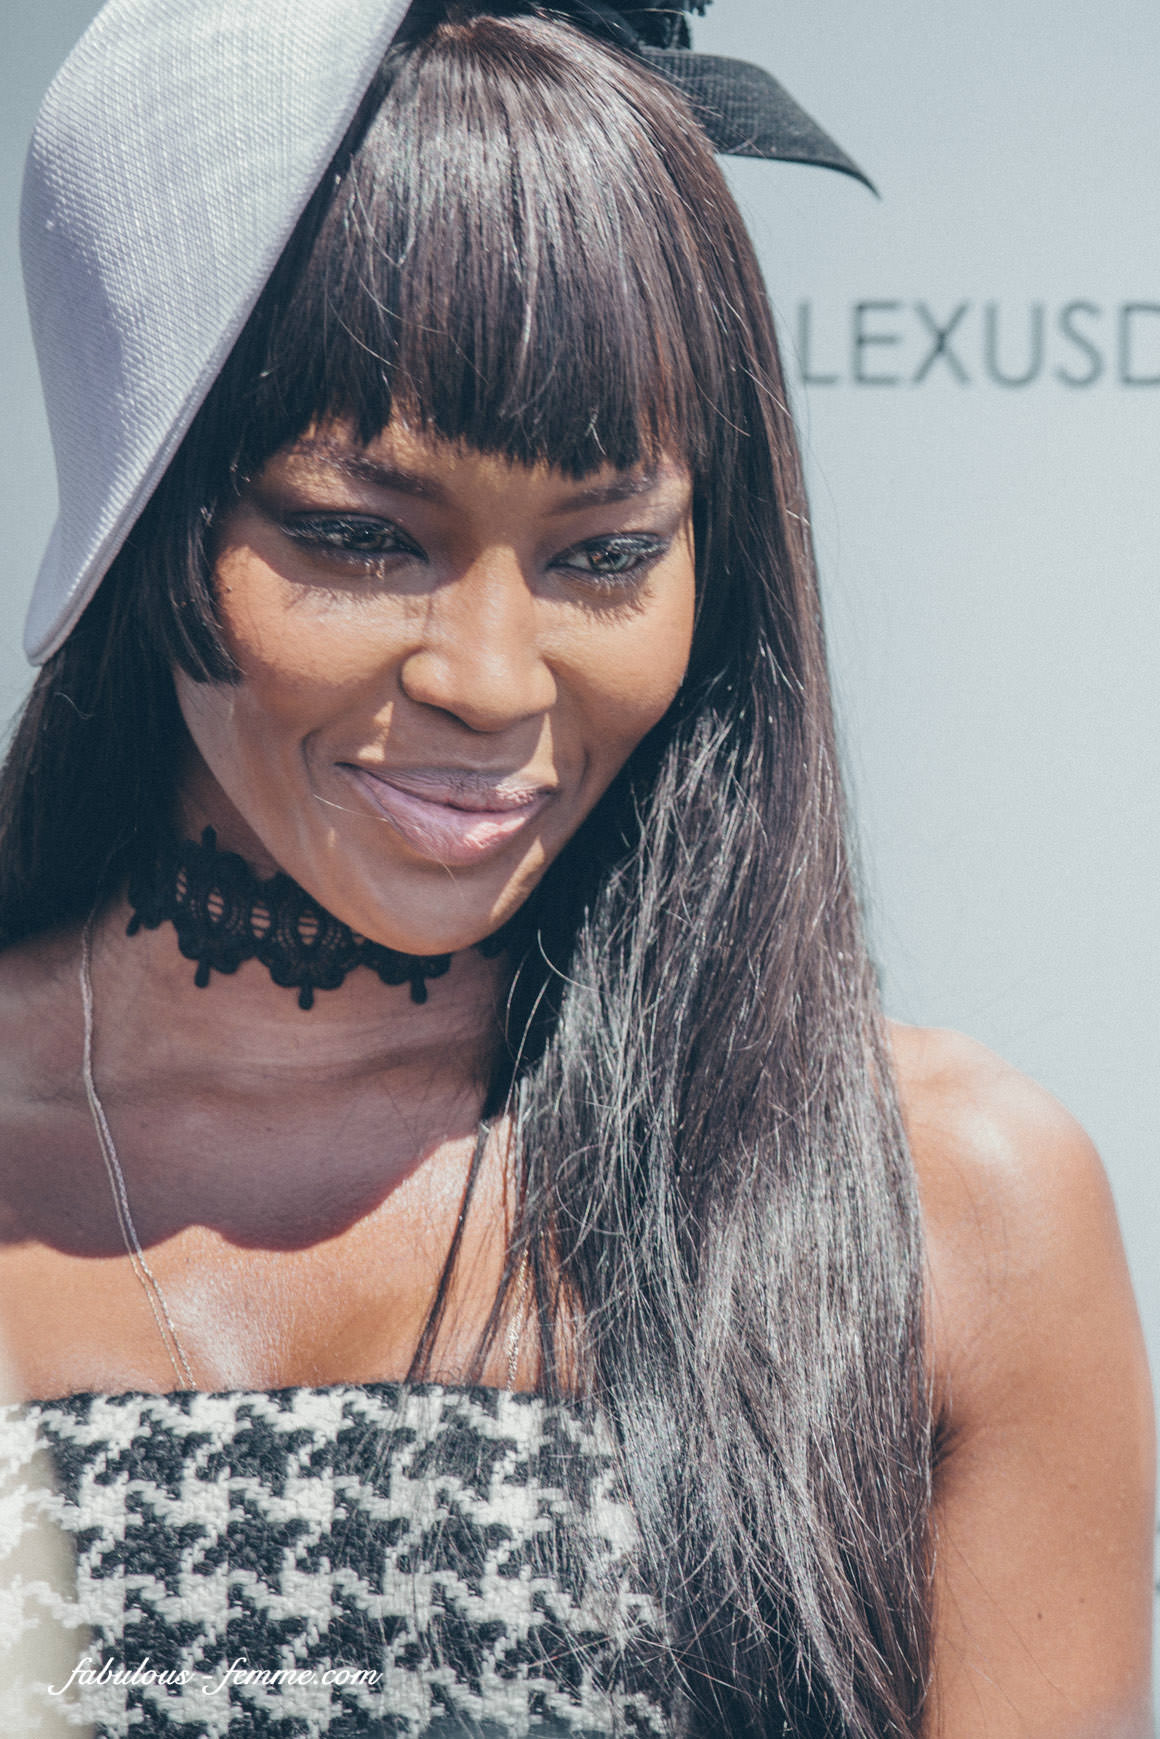 Supermodel Naomi Campbell - Portrait